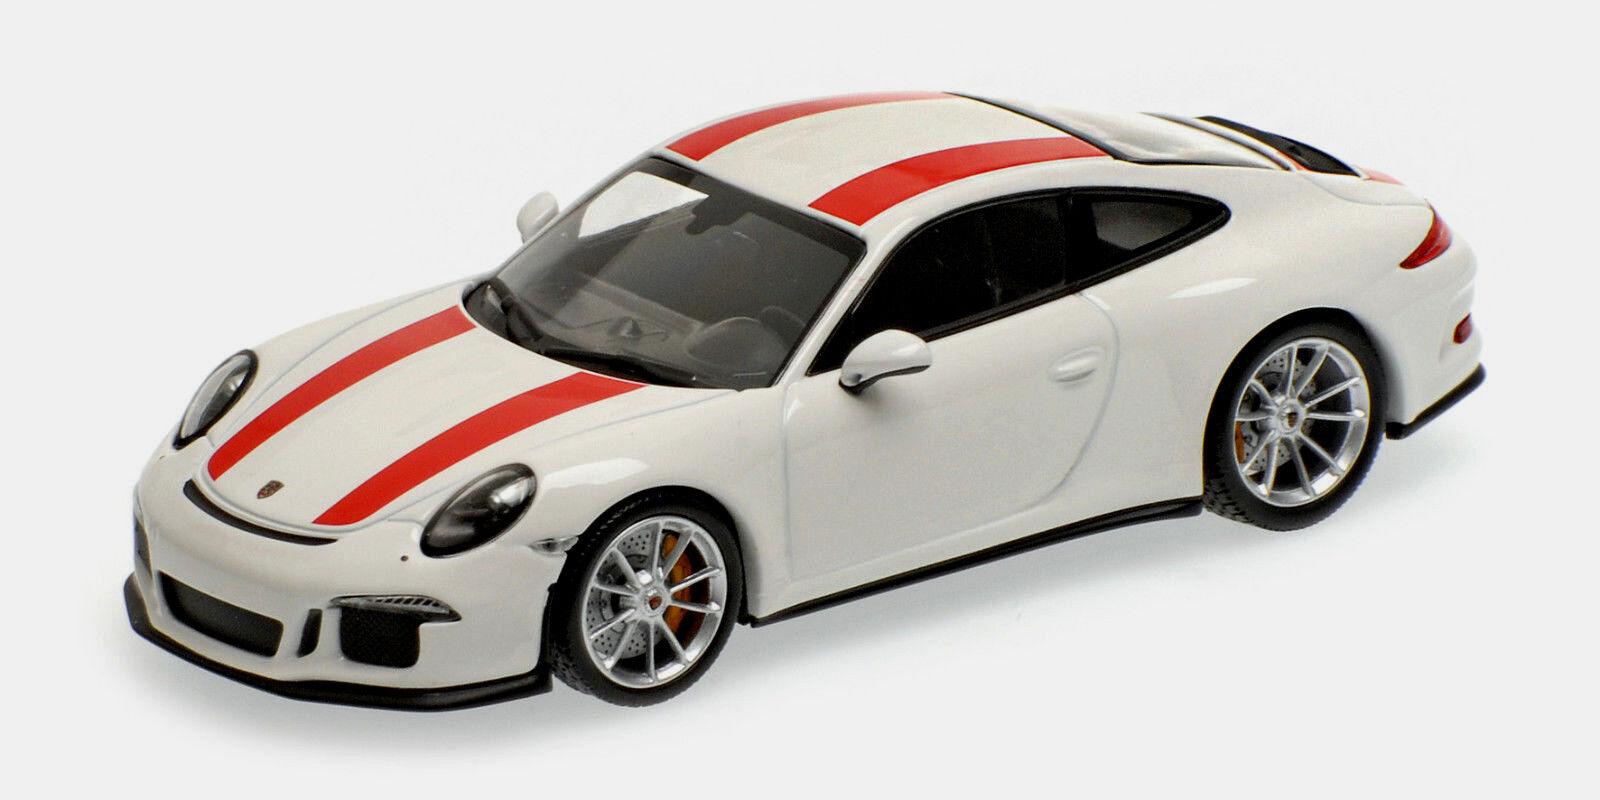 Buen Porsche 911r (991) 2016 - blancoo   rojo - 1   43 - lim.ed.504 unidades.